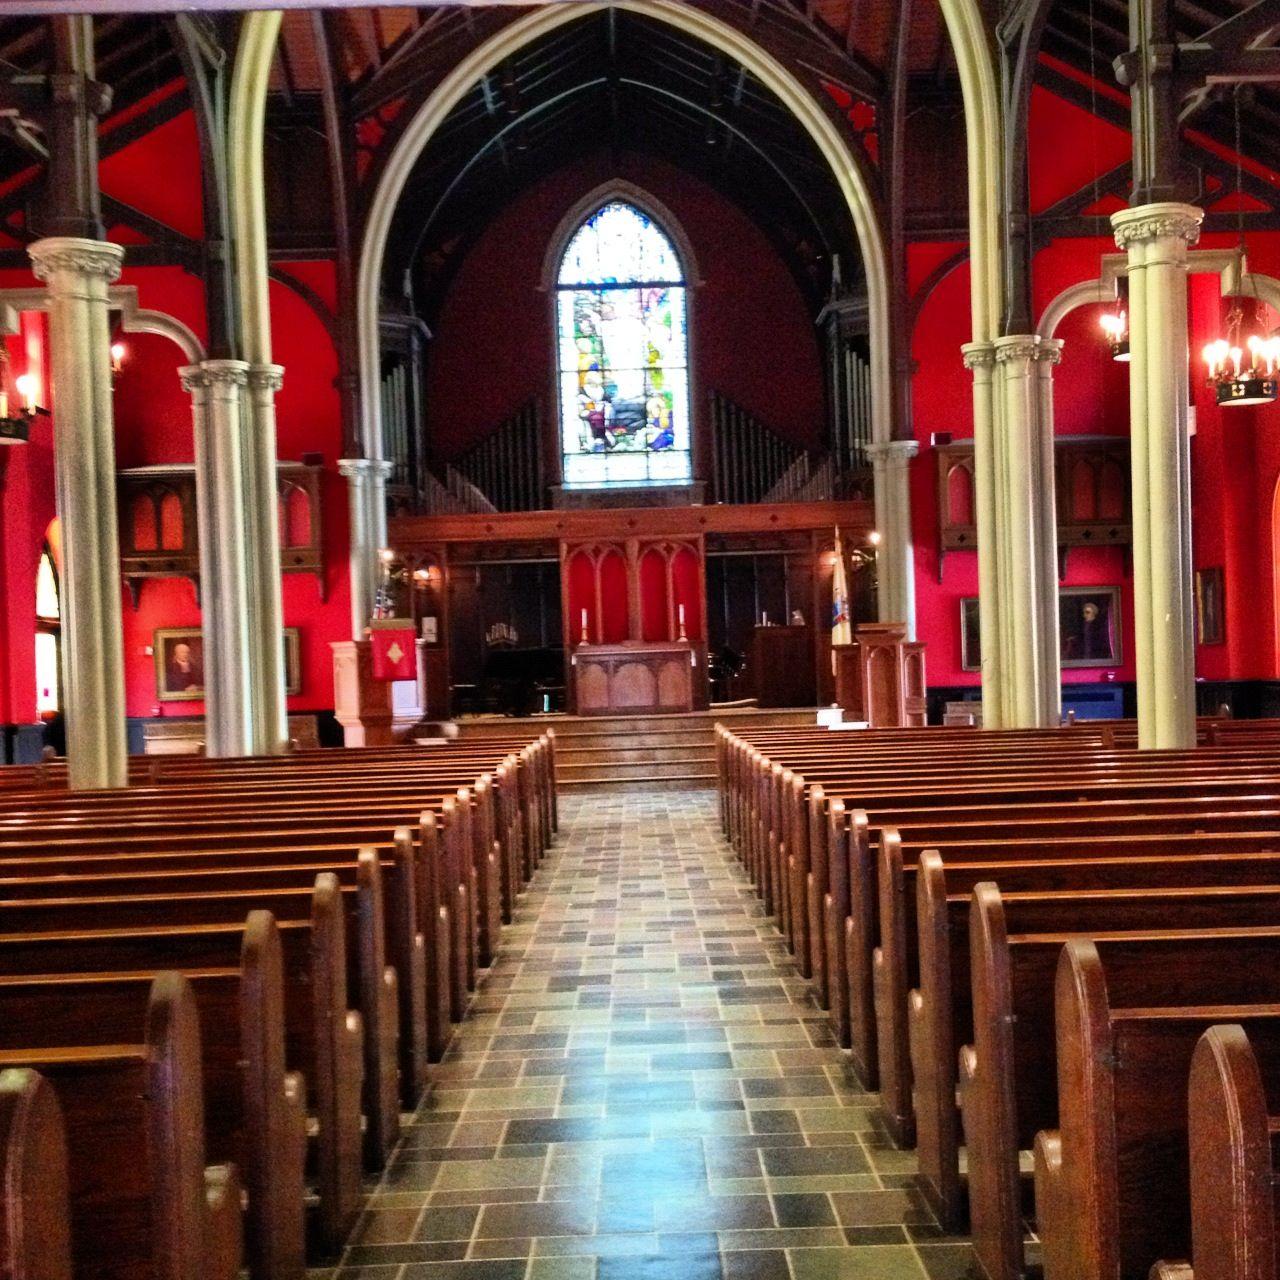 Rutgers Kirkpatrick Chapel New Brunswick NJ The Annual Christmas Concert